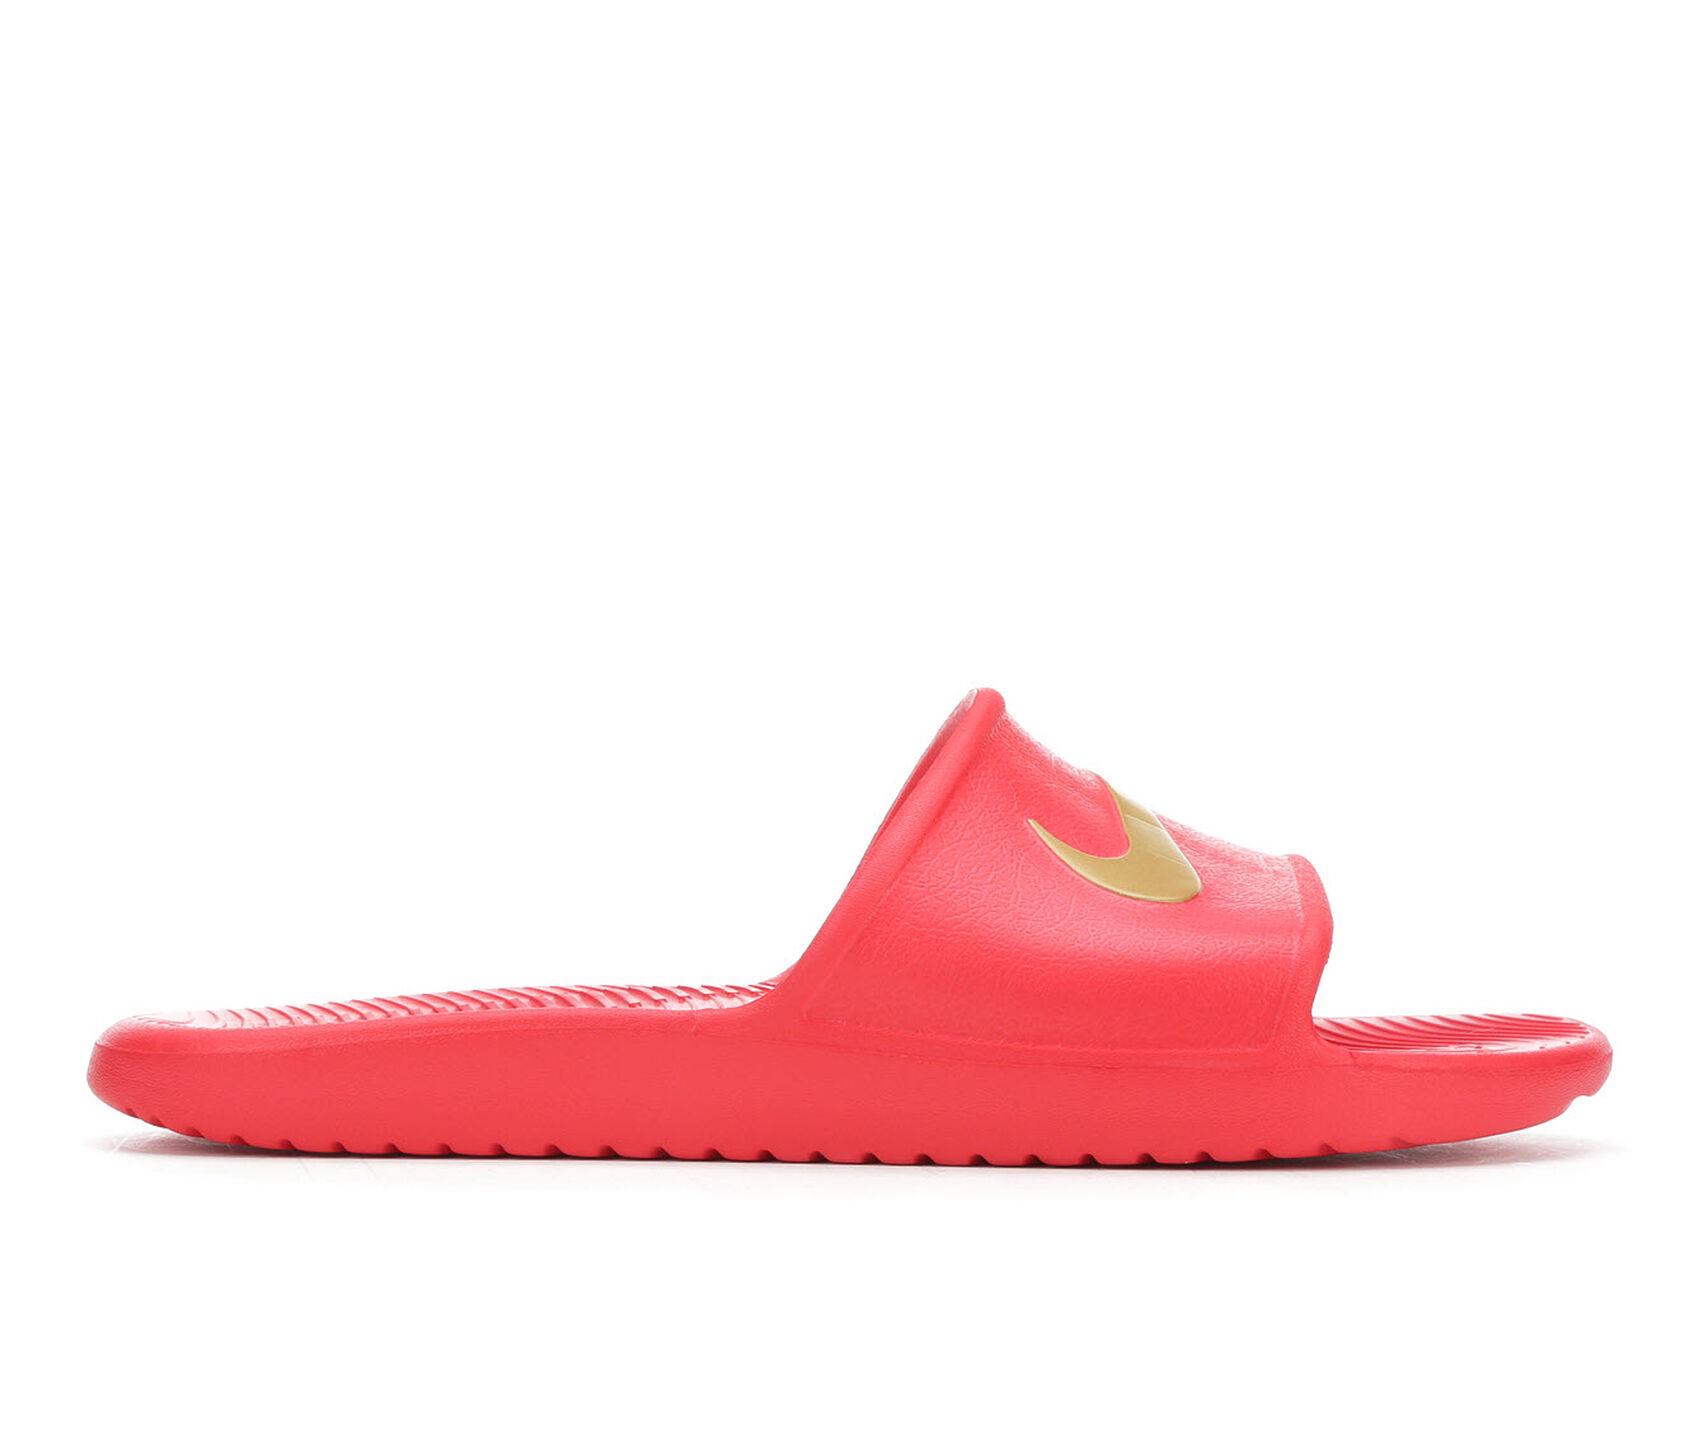 size 40 f91e0 d4c18 Men's Nike Kawa Shower Sport Slides